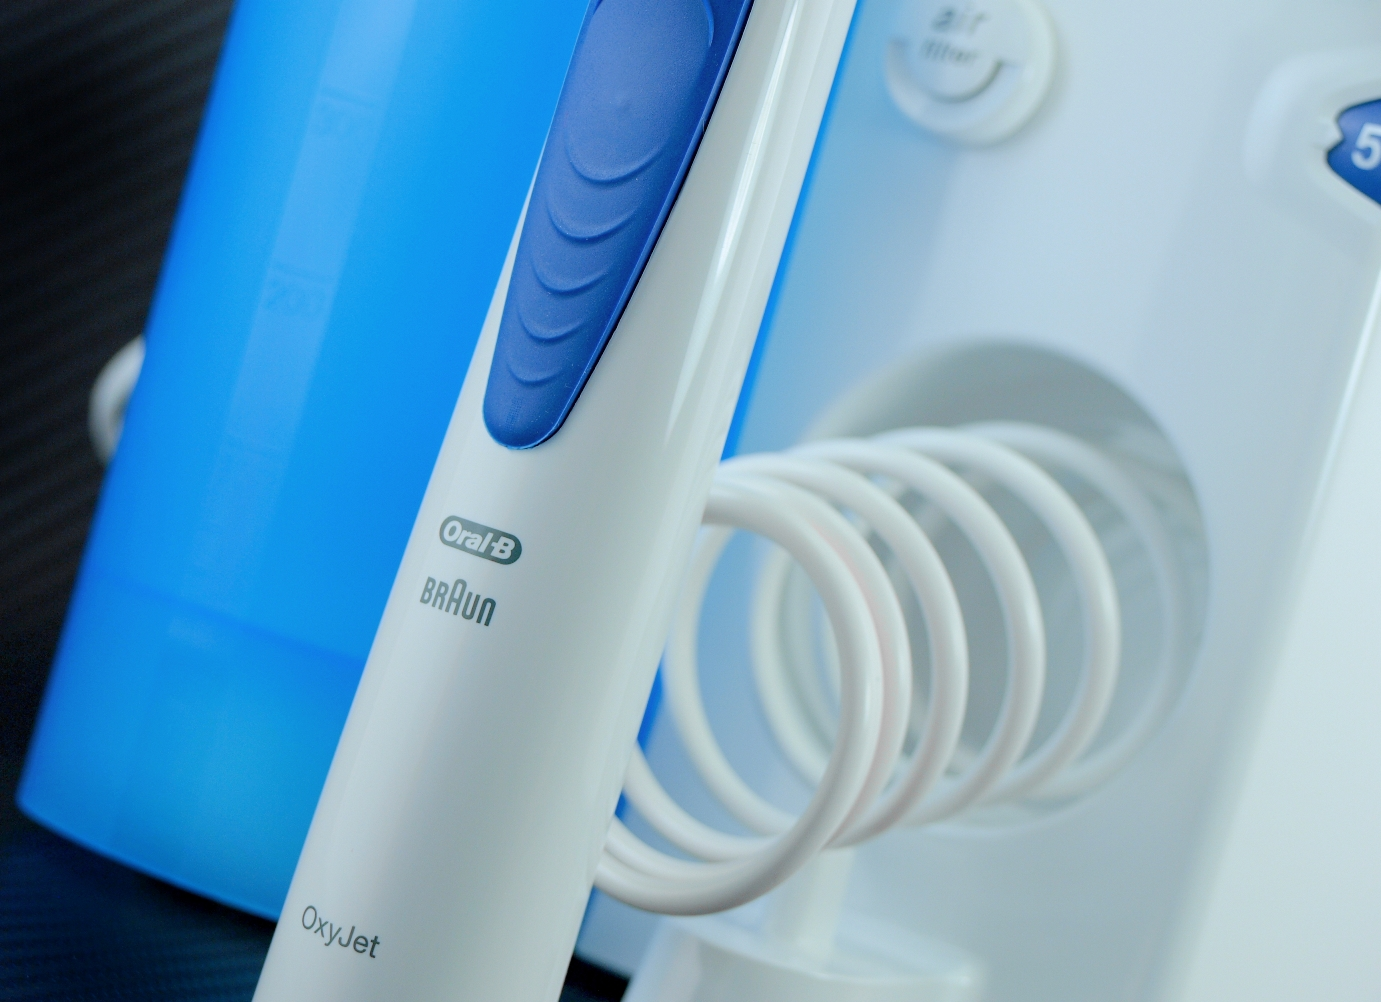 Oral b professionalcare oxyjet 8 фотография